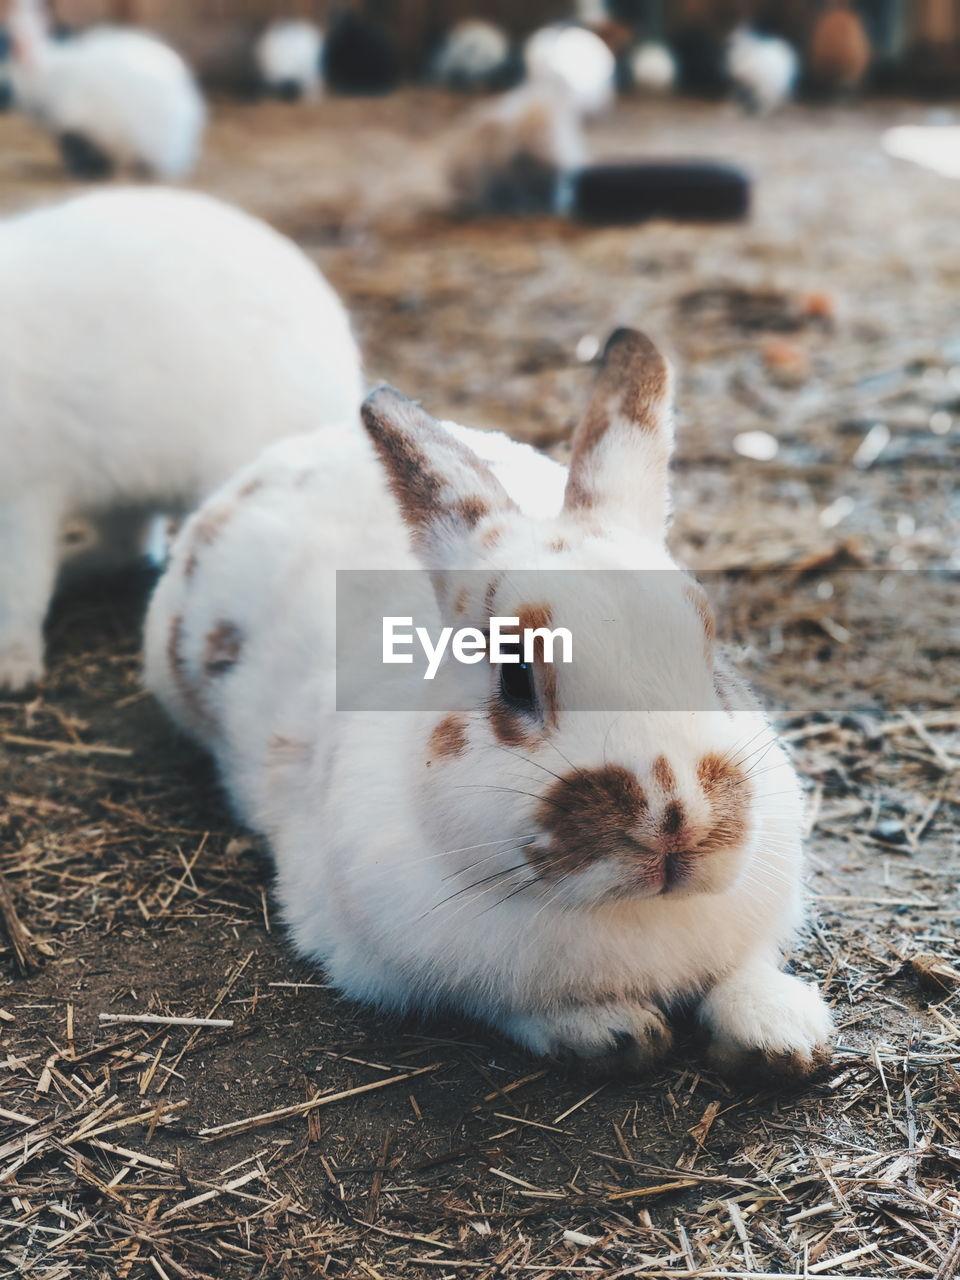 Rabbit sitting on footpath